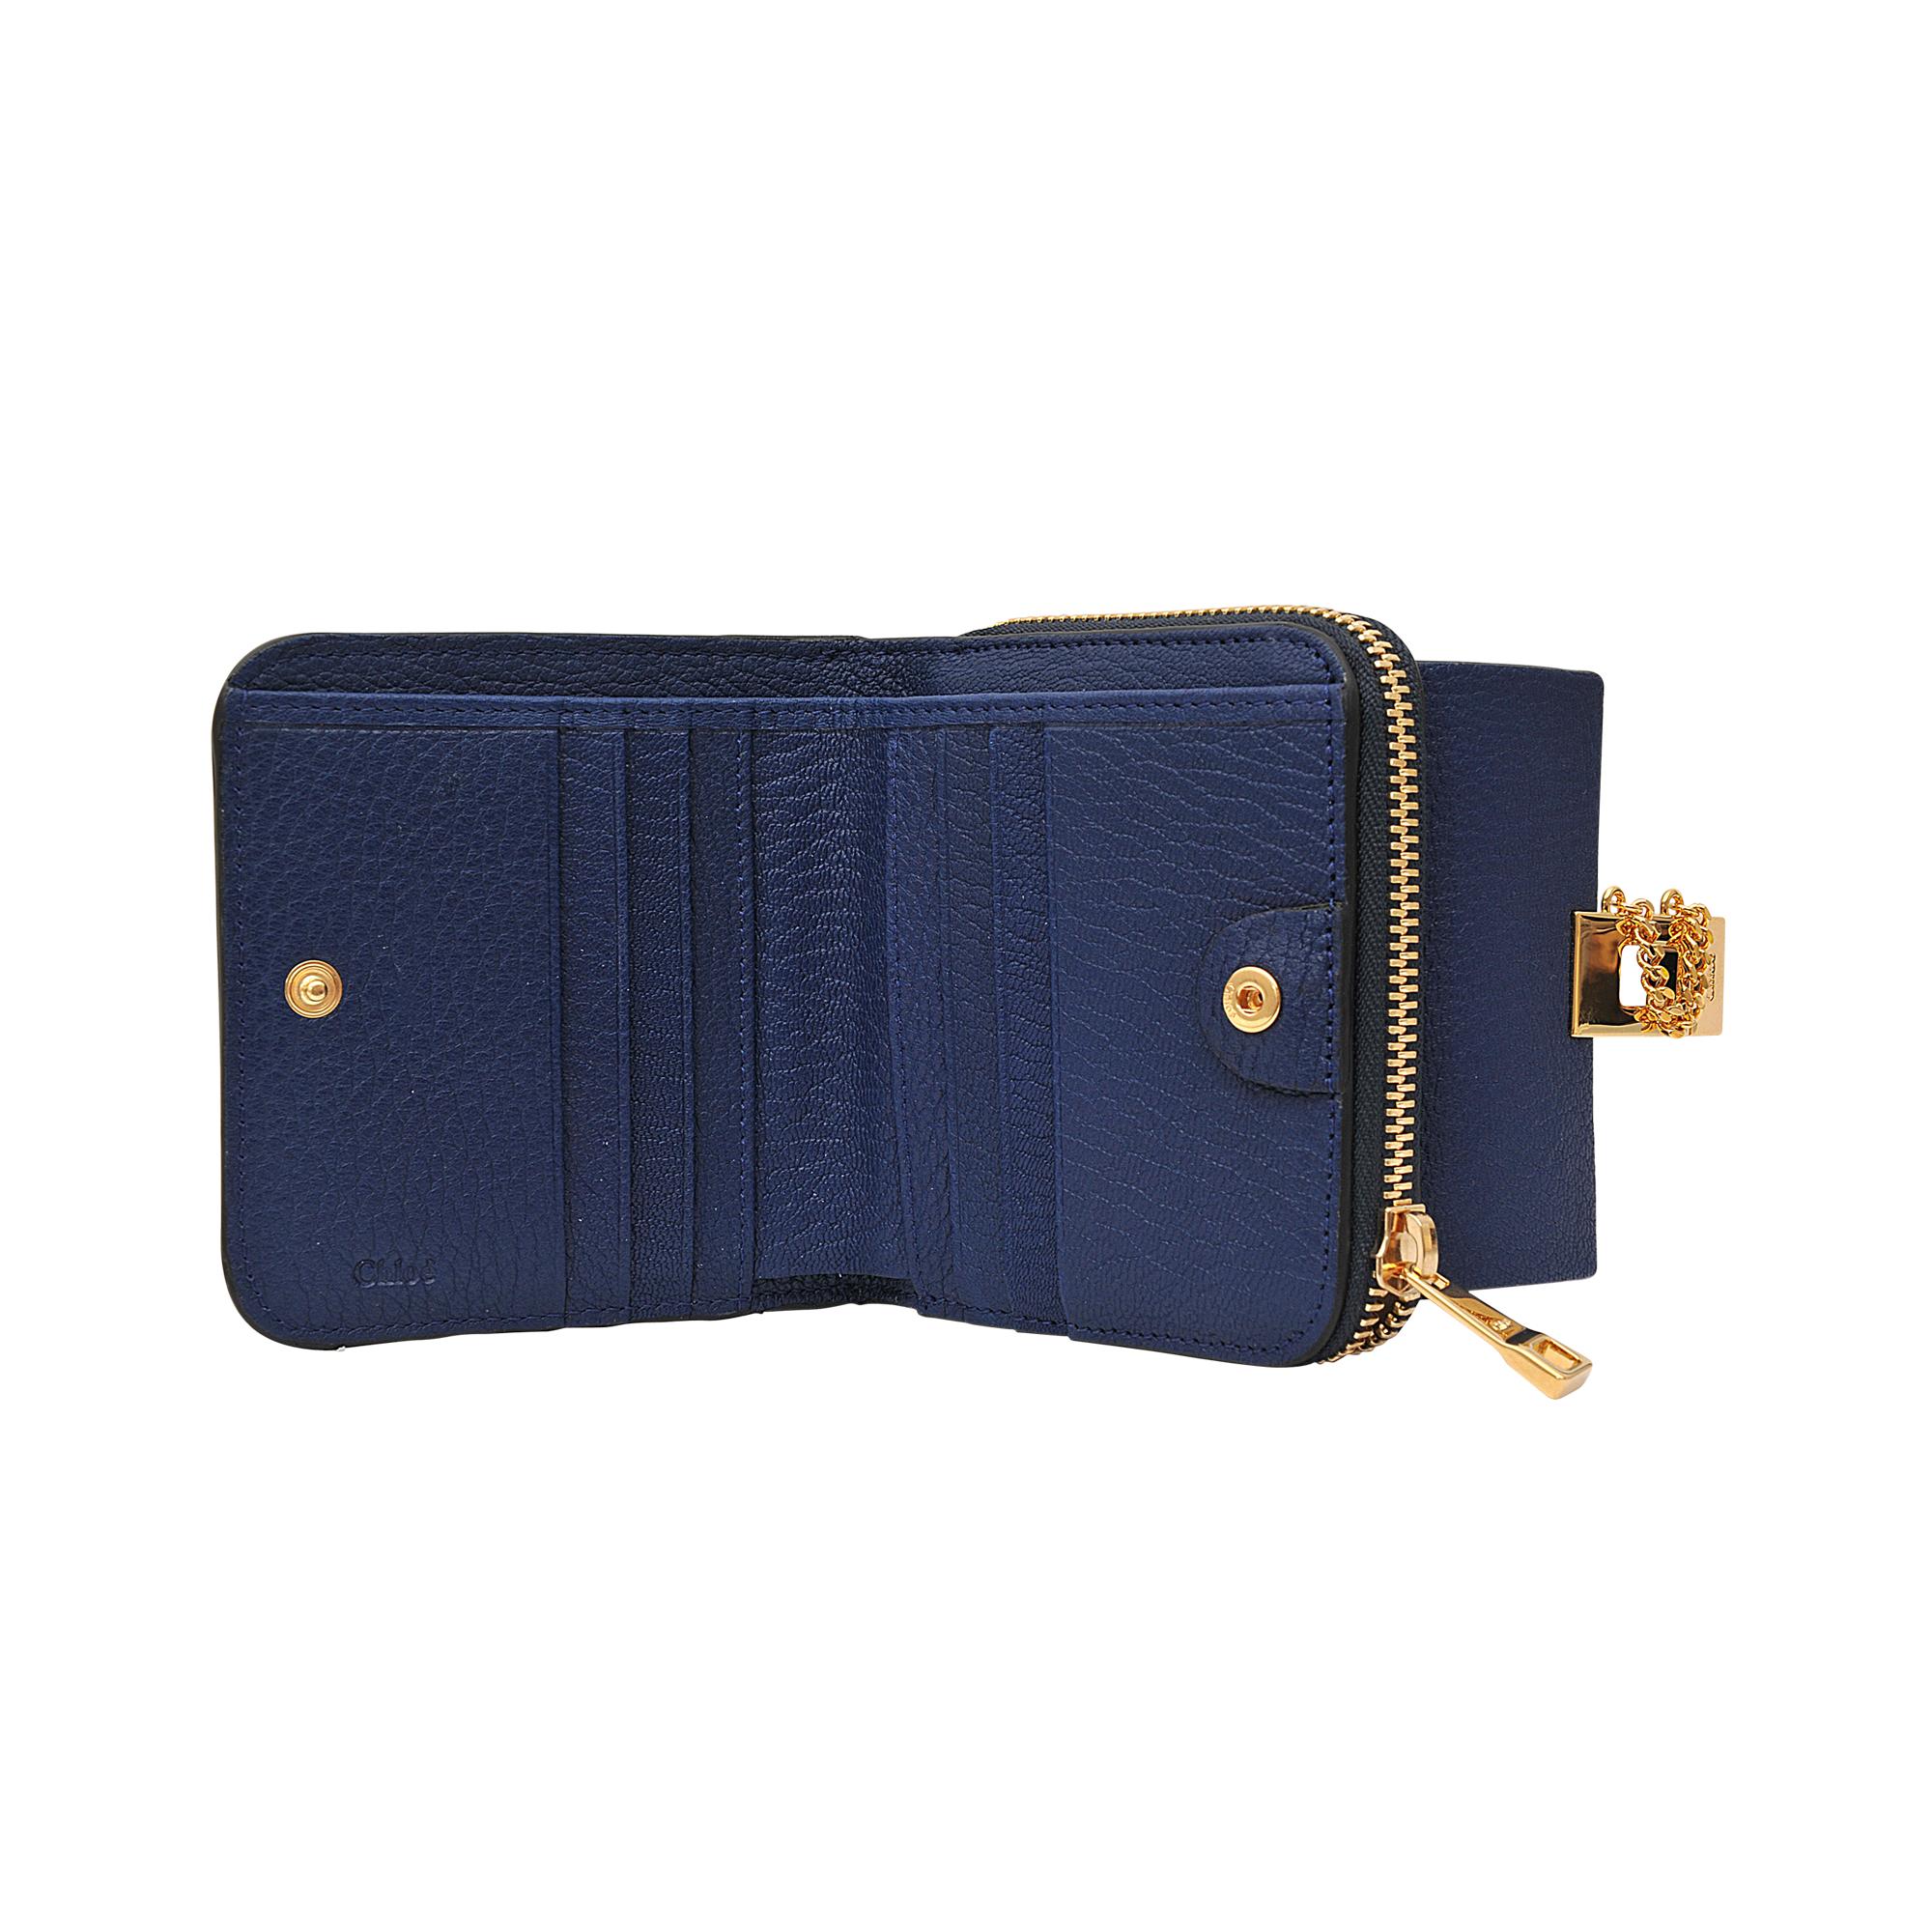 chloe elsie python bag - Chlo�� Drew Square Zipped Wallet in Blue | Lyst